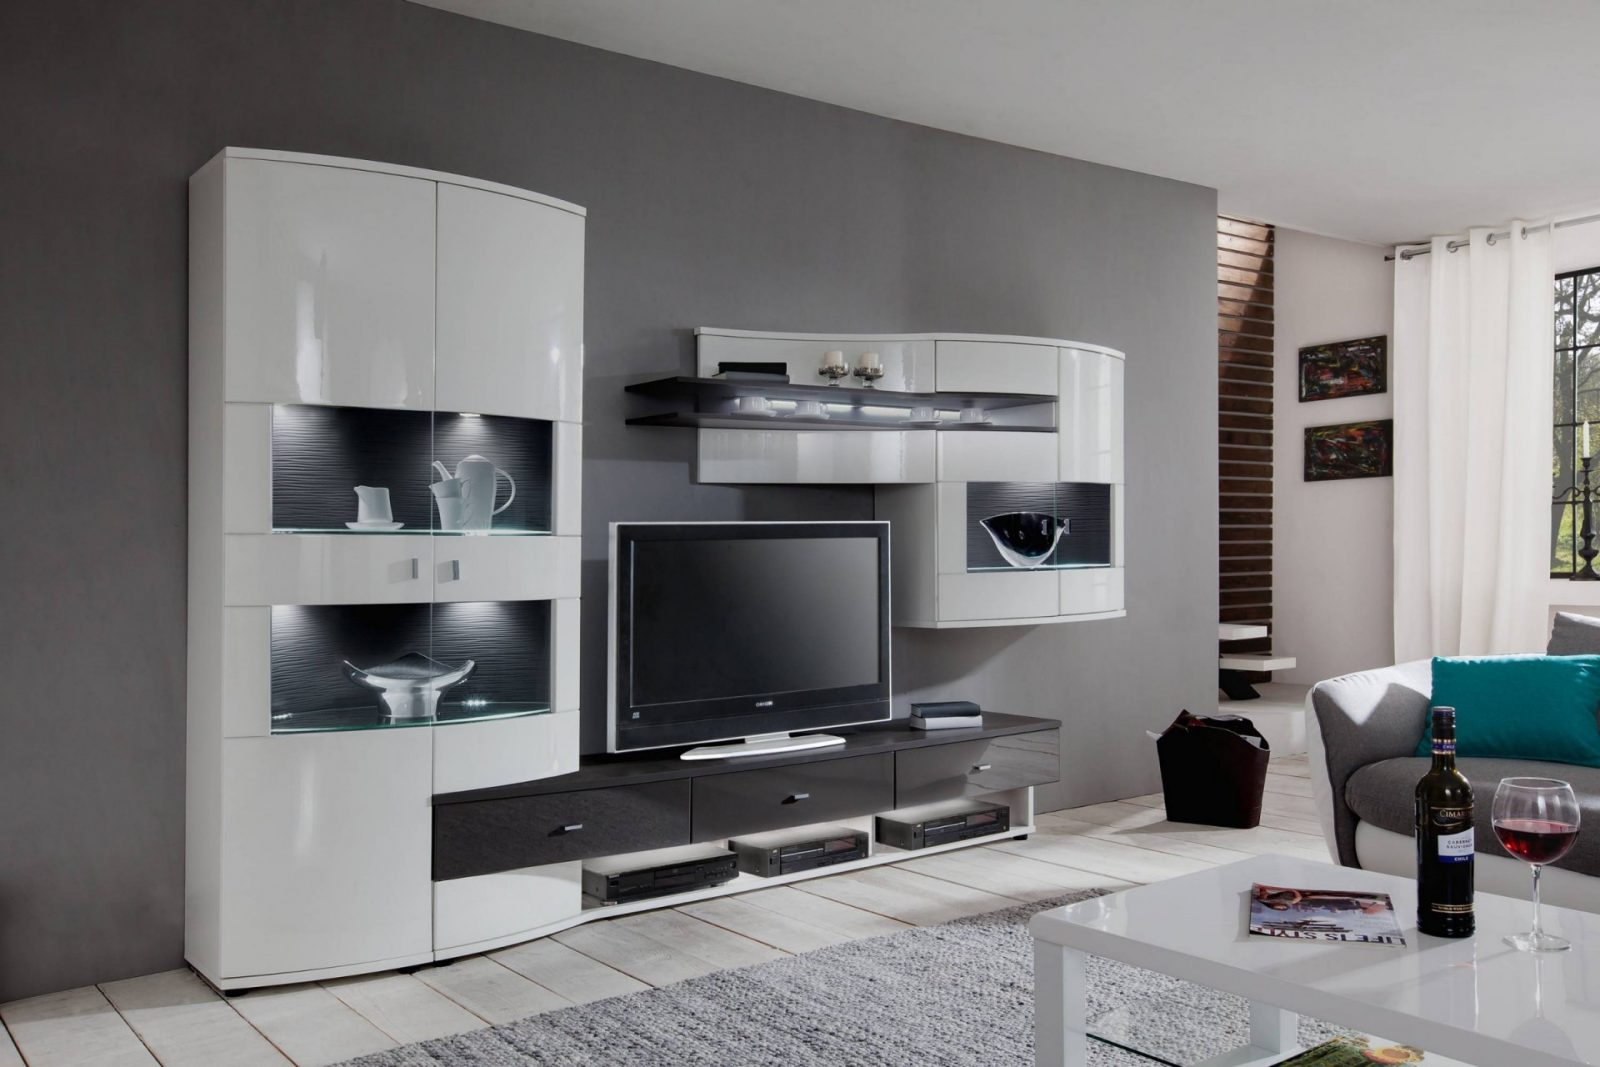 35 Moderne Wohnwand Weis Hochglanz Ikea  Ahhadesigns von Ikea Wohnwand Weiß Hochglanz Bild